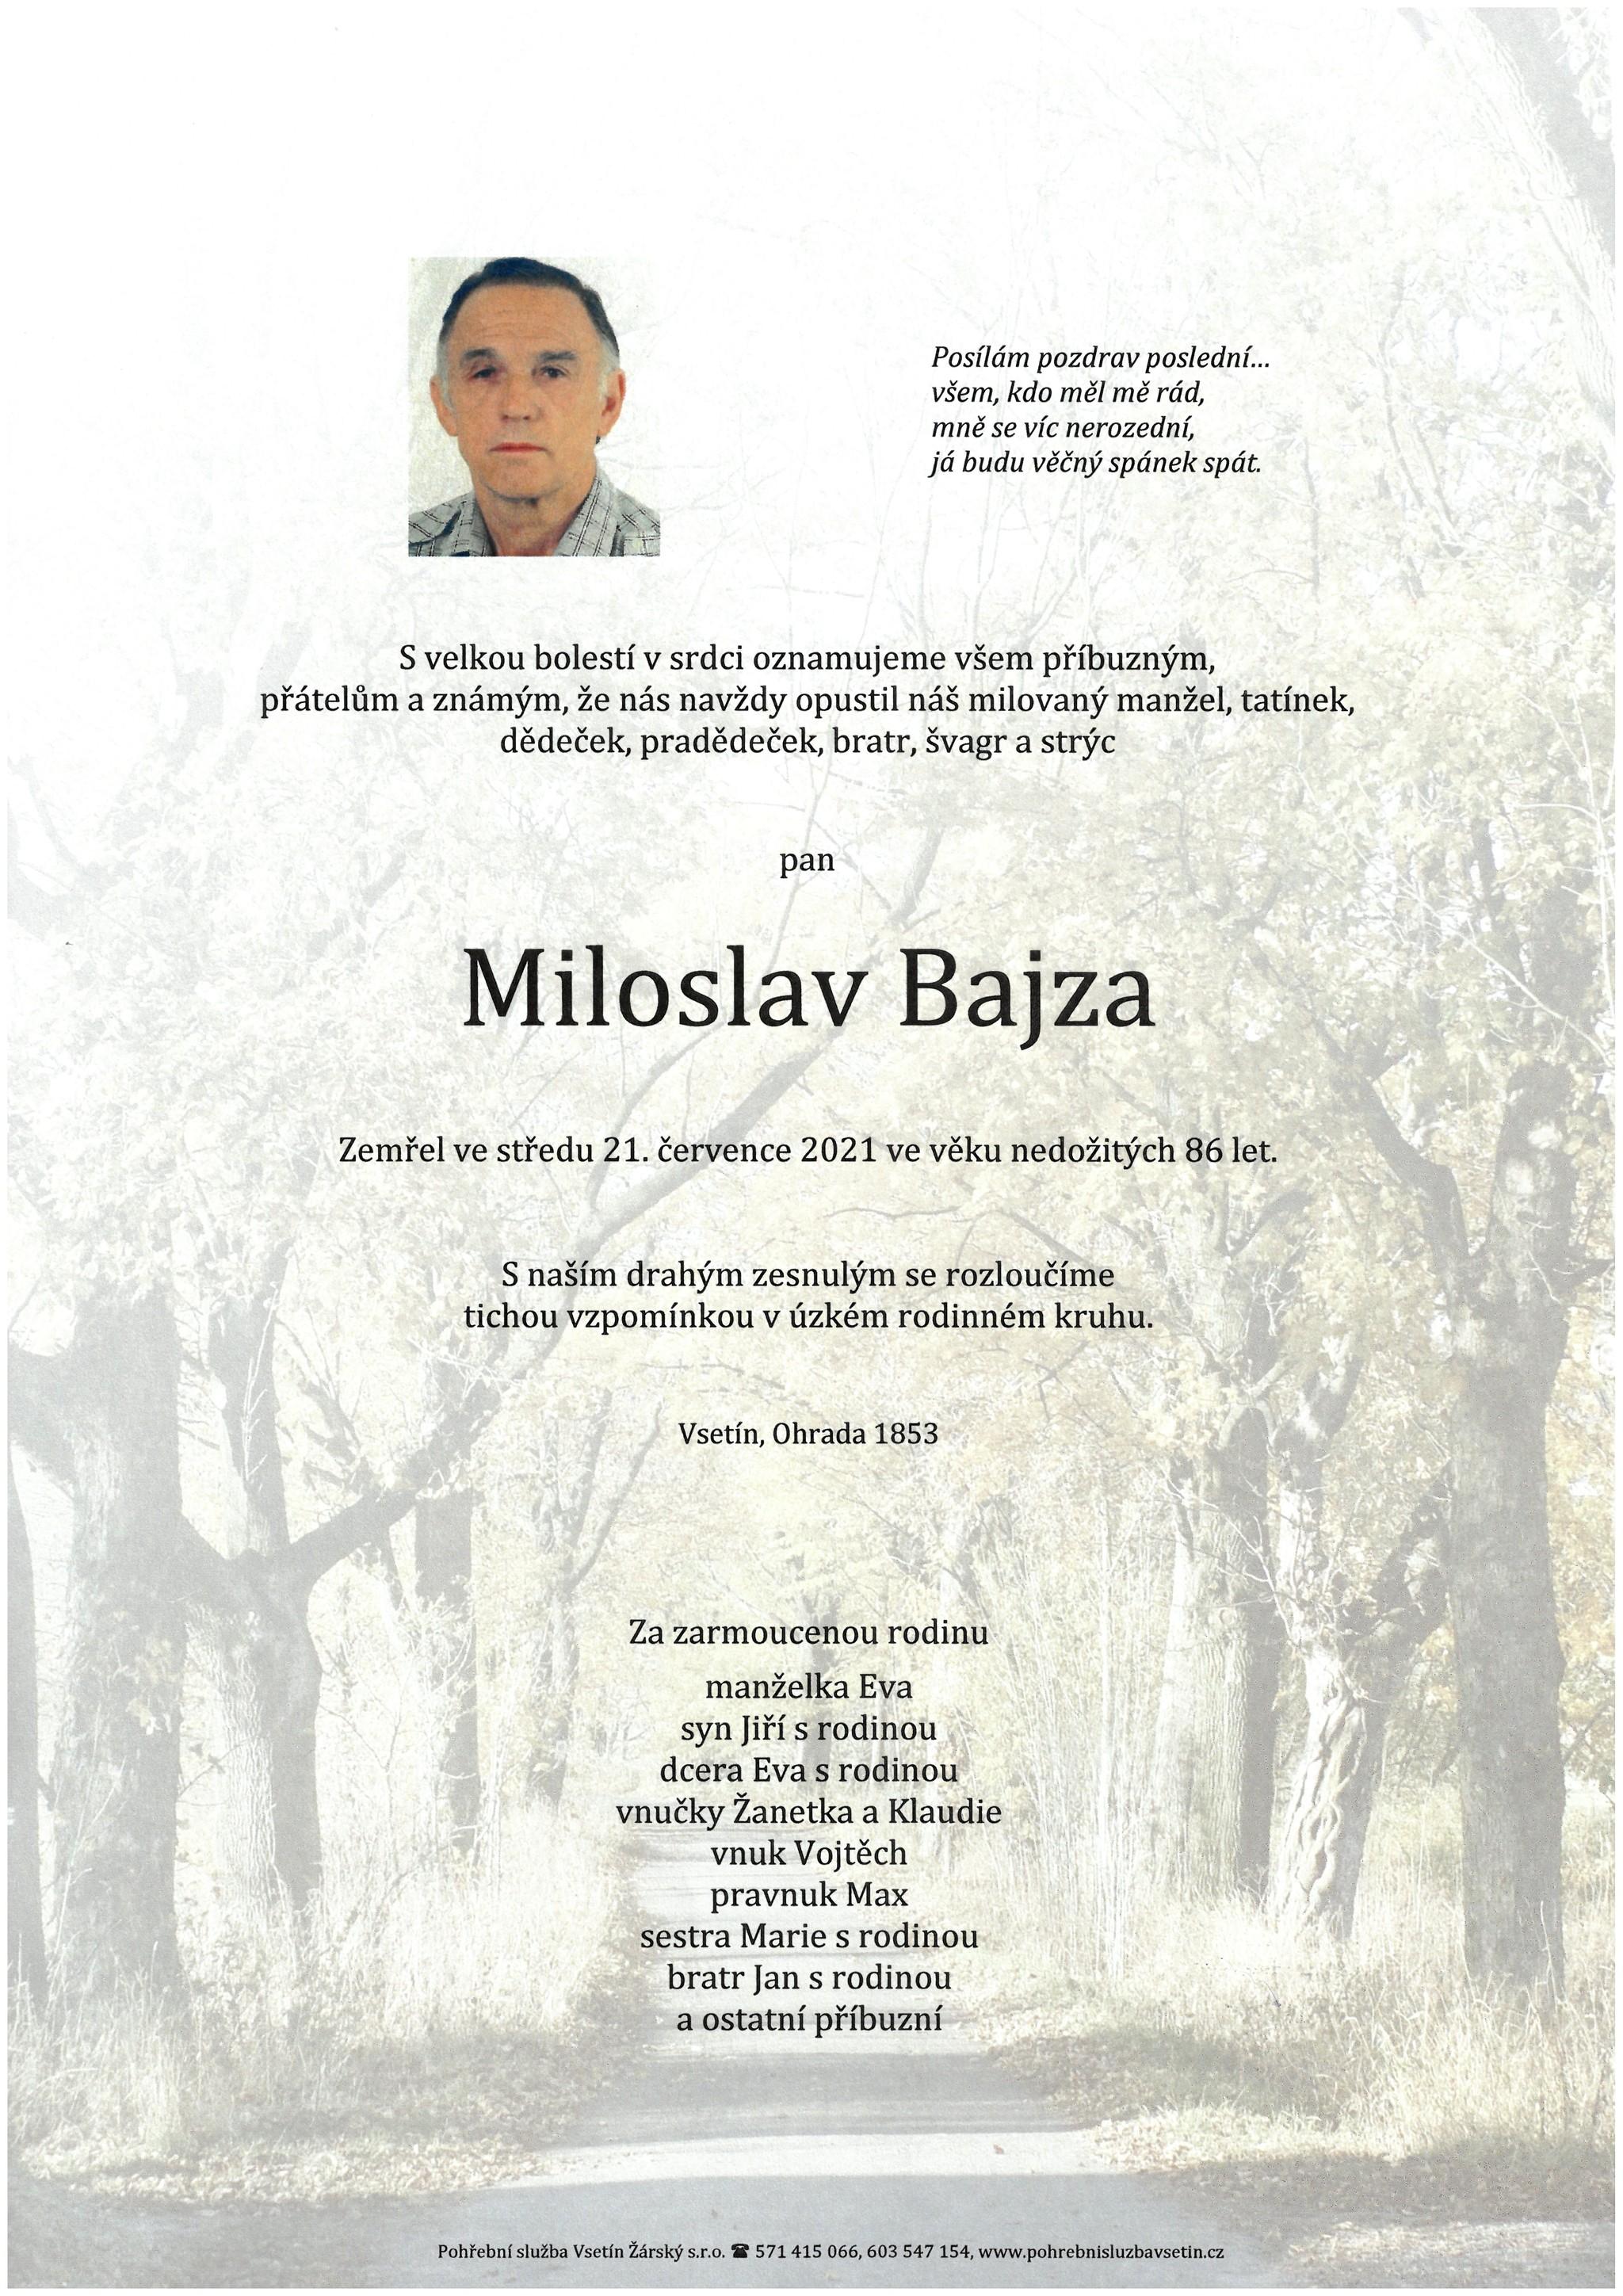 Miloslav Bajza